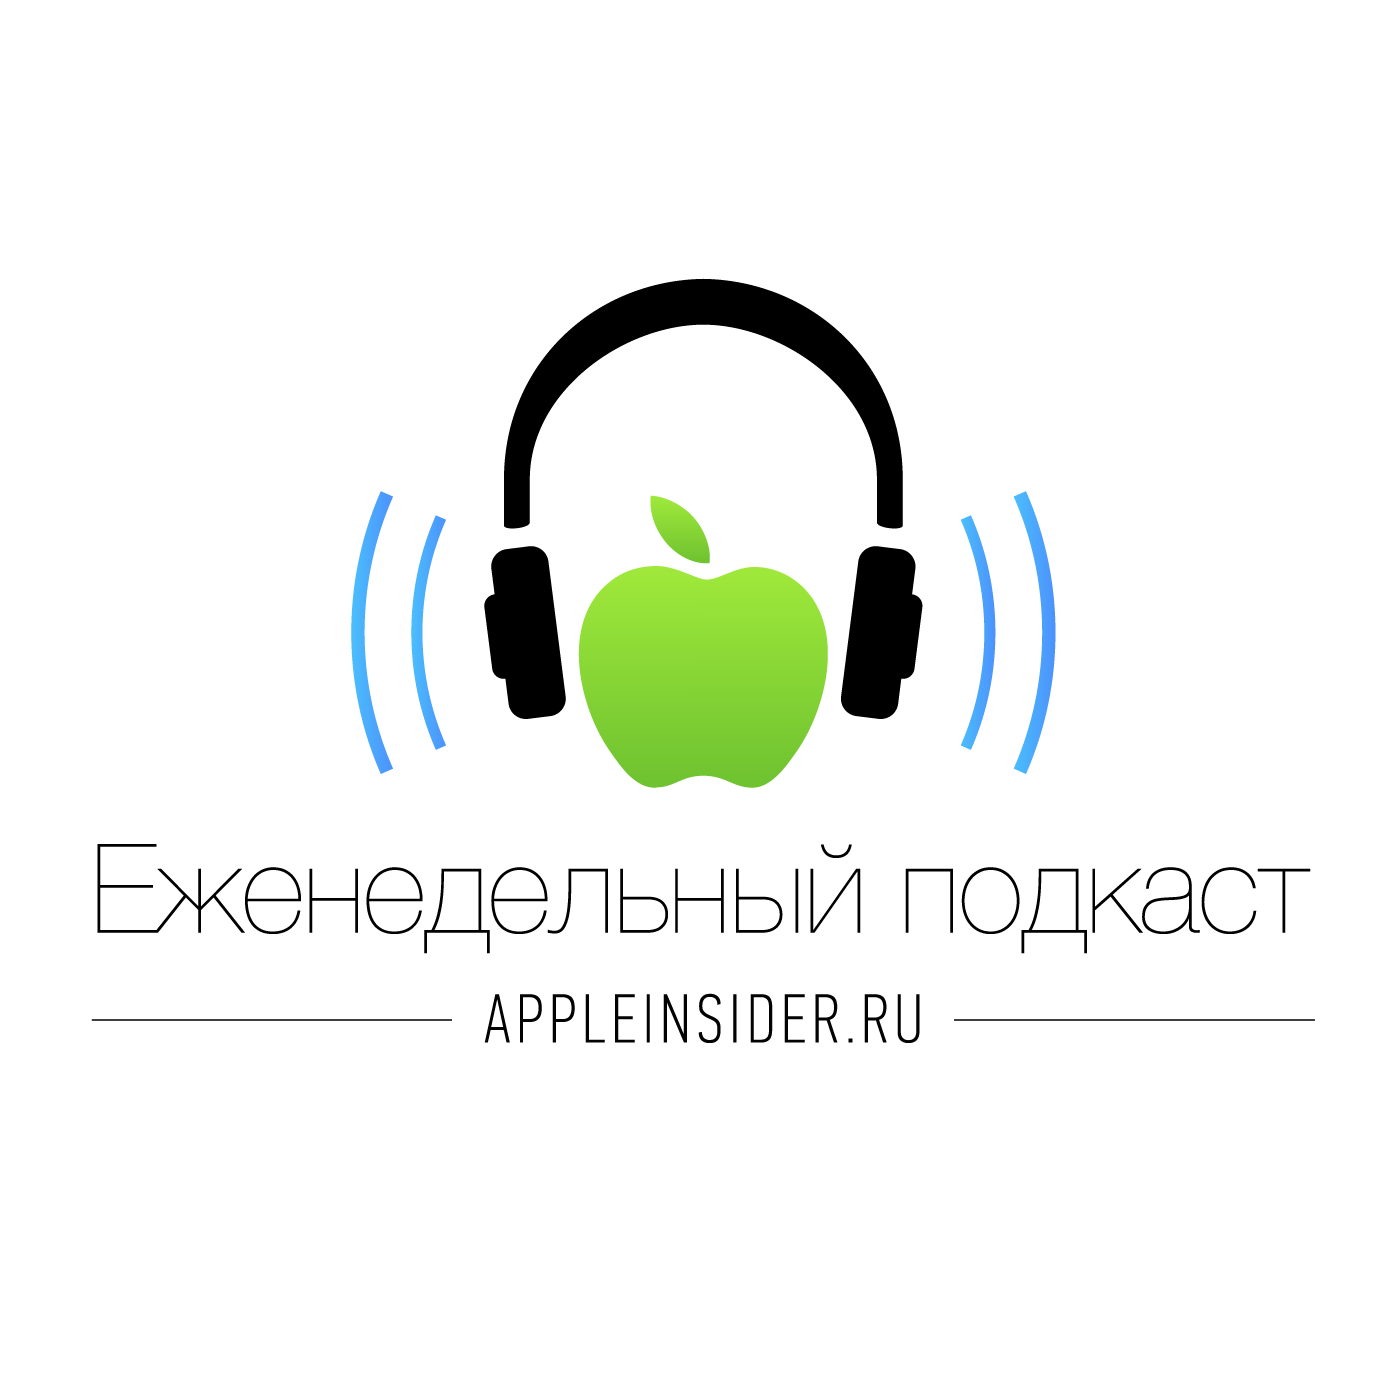 Миша Королев NOKIA 3310 iriver iriver astell